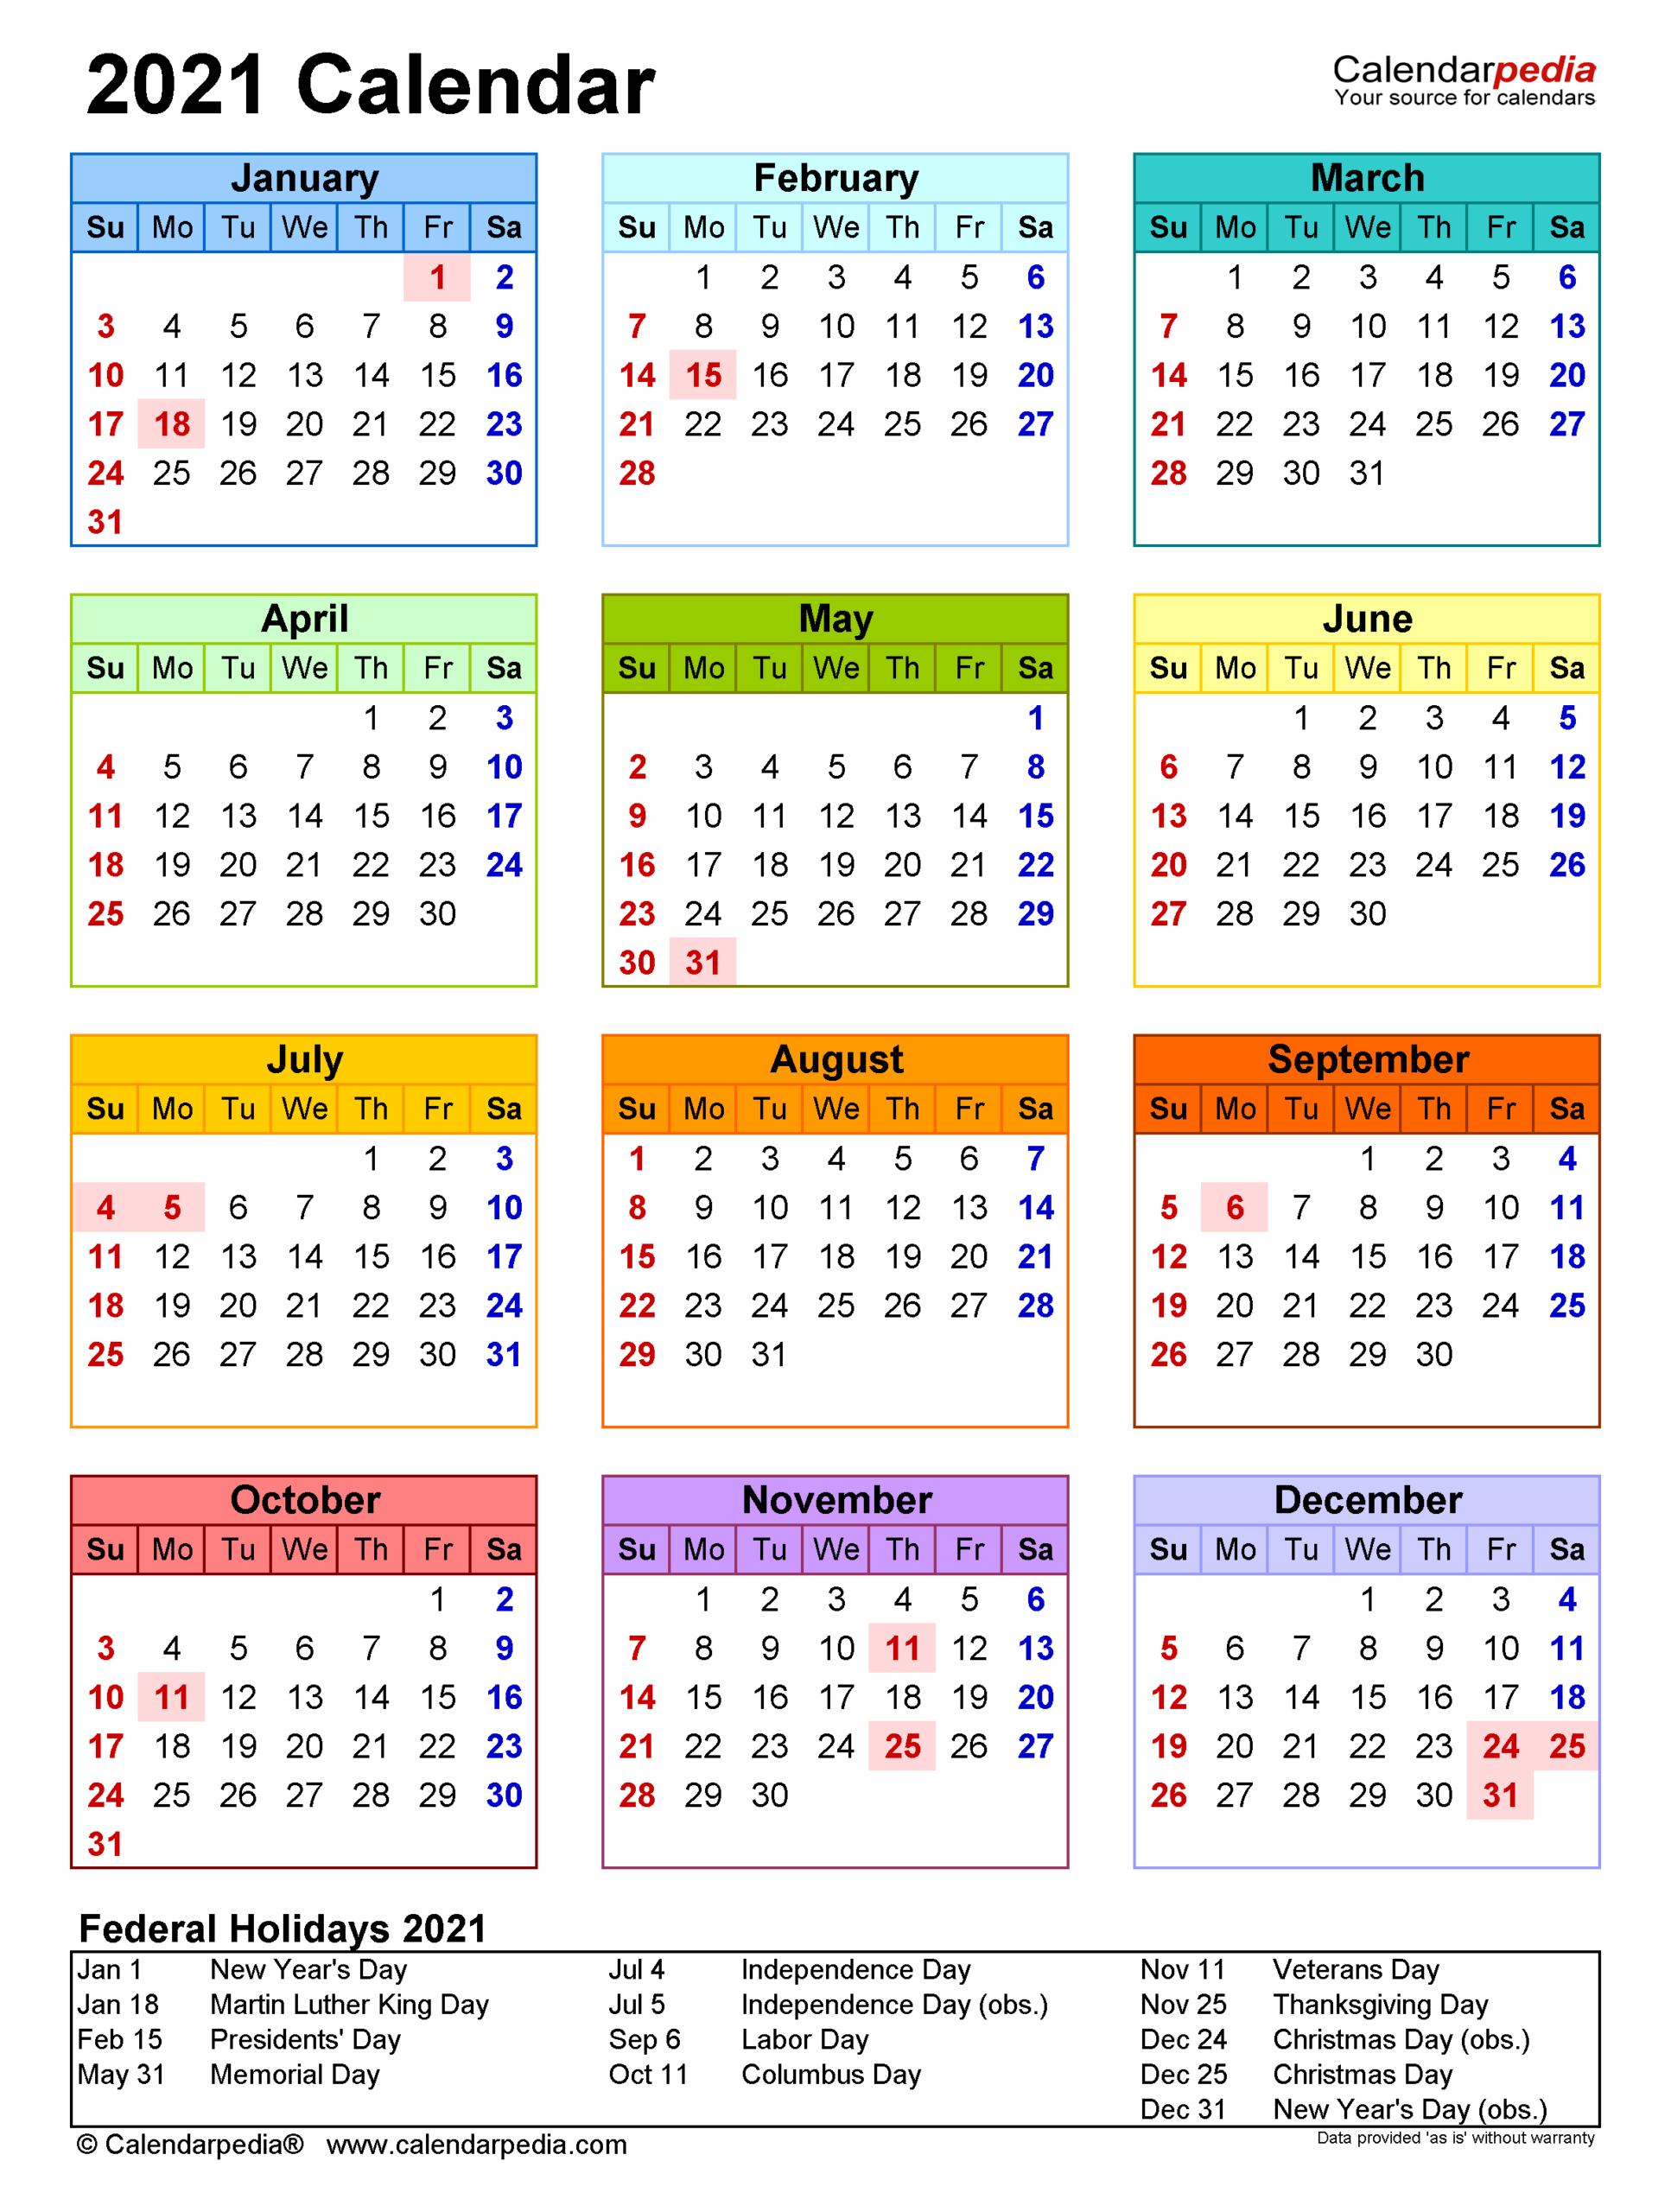 2021 Calendar - Free Printable Excel Templates - Calendarpedia regarding Calendar 2021 Aramco